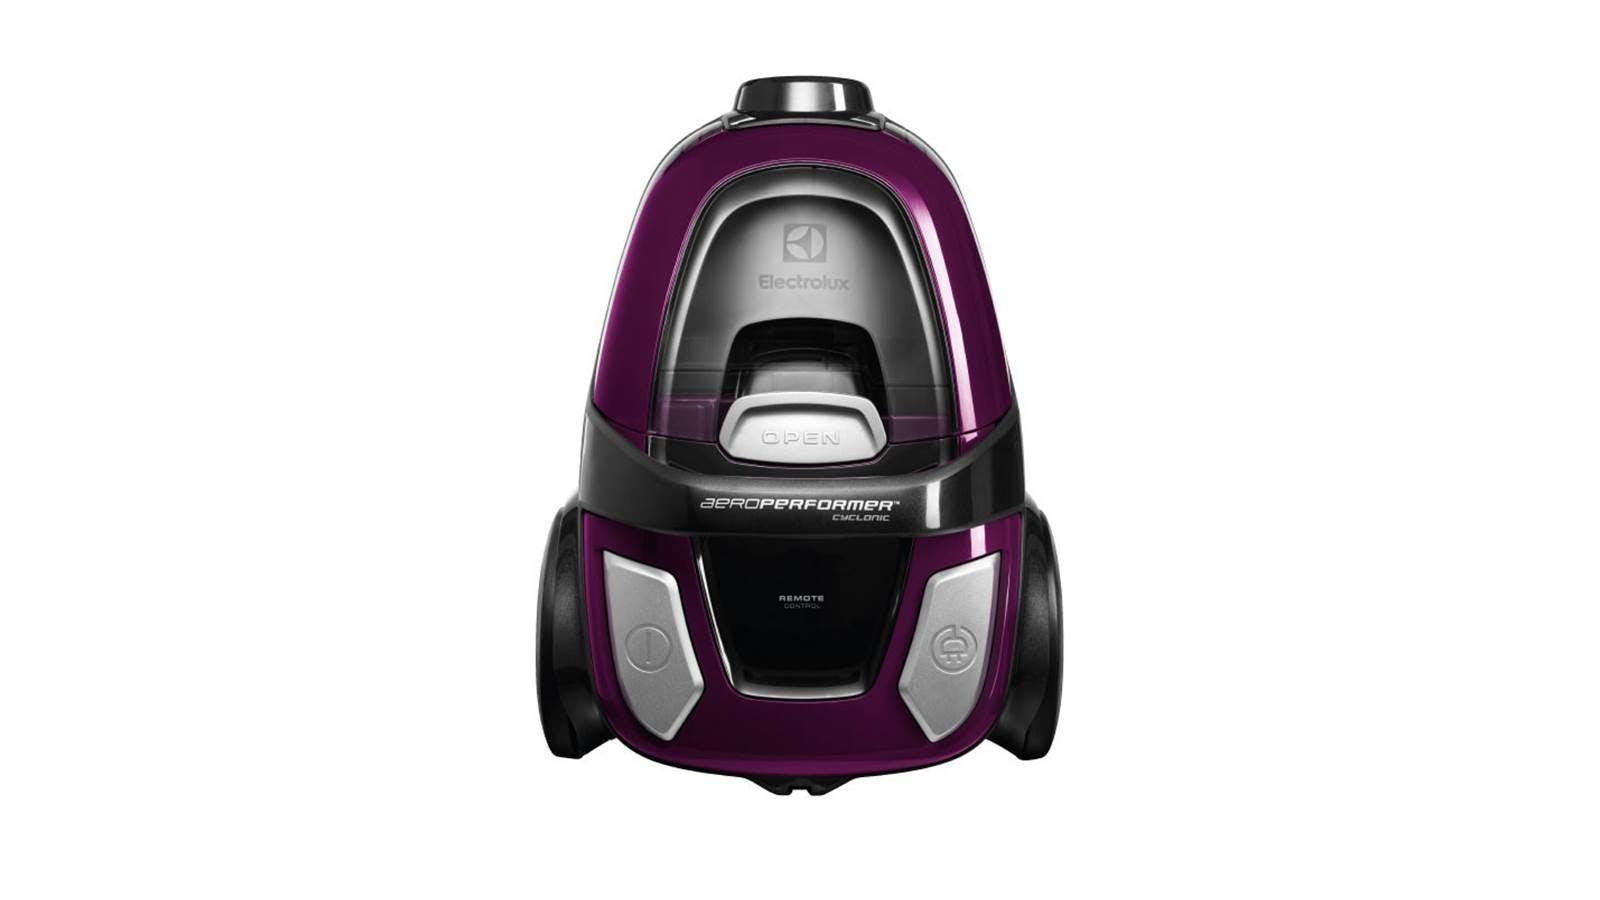 Electrolux ZAP 9940 Bagless Vacuum Cleaner